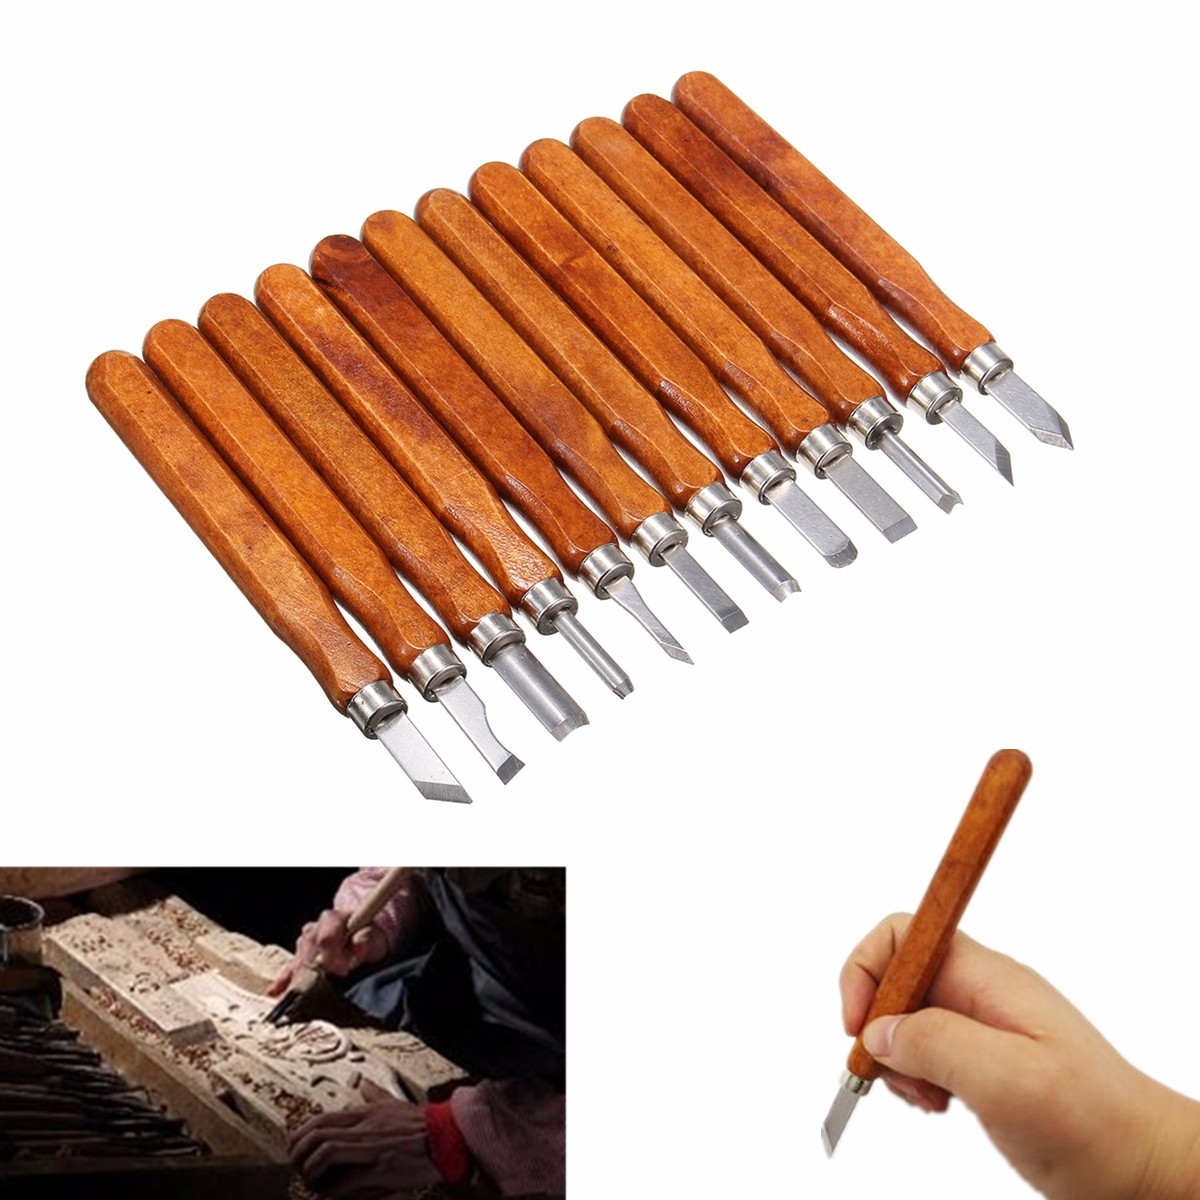 12Pcs Wood Carving Woodworking Hand Chisel Set ...